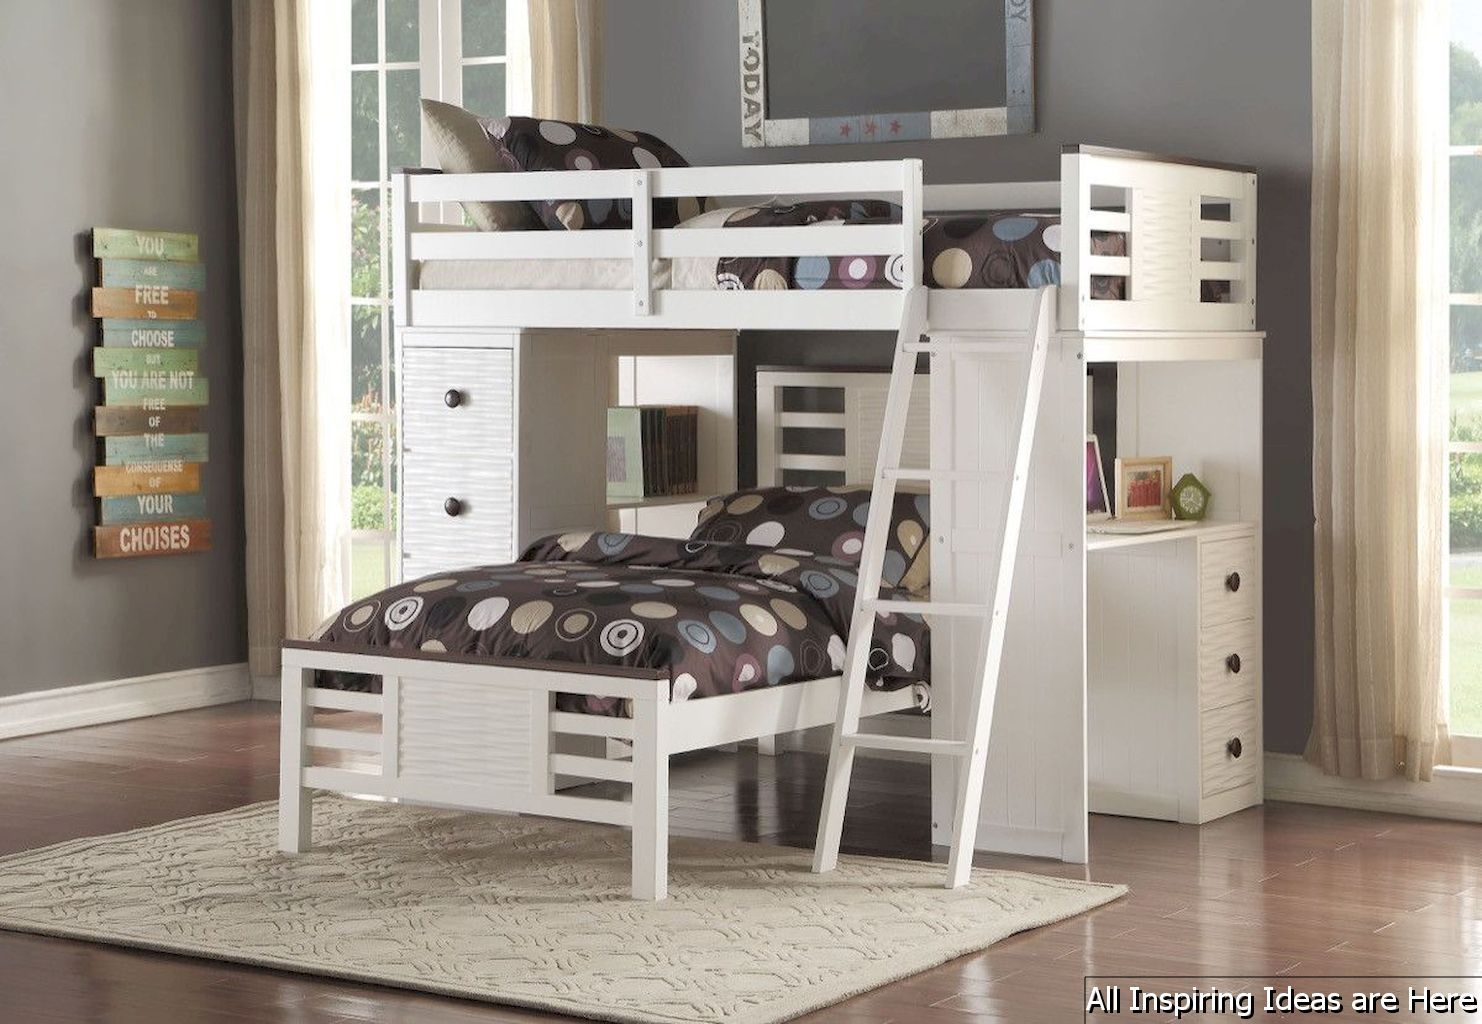 Loft bedroom style   Nice Loft Bedroom Design and Decor Ideas  Loft bedrooms Lofts